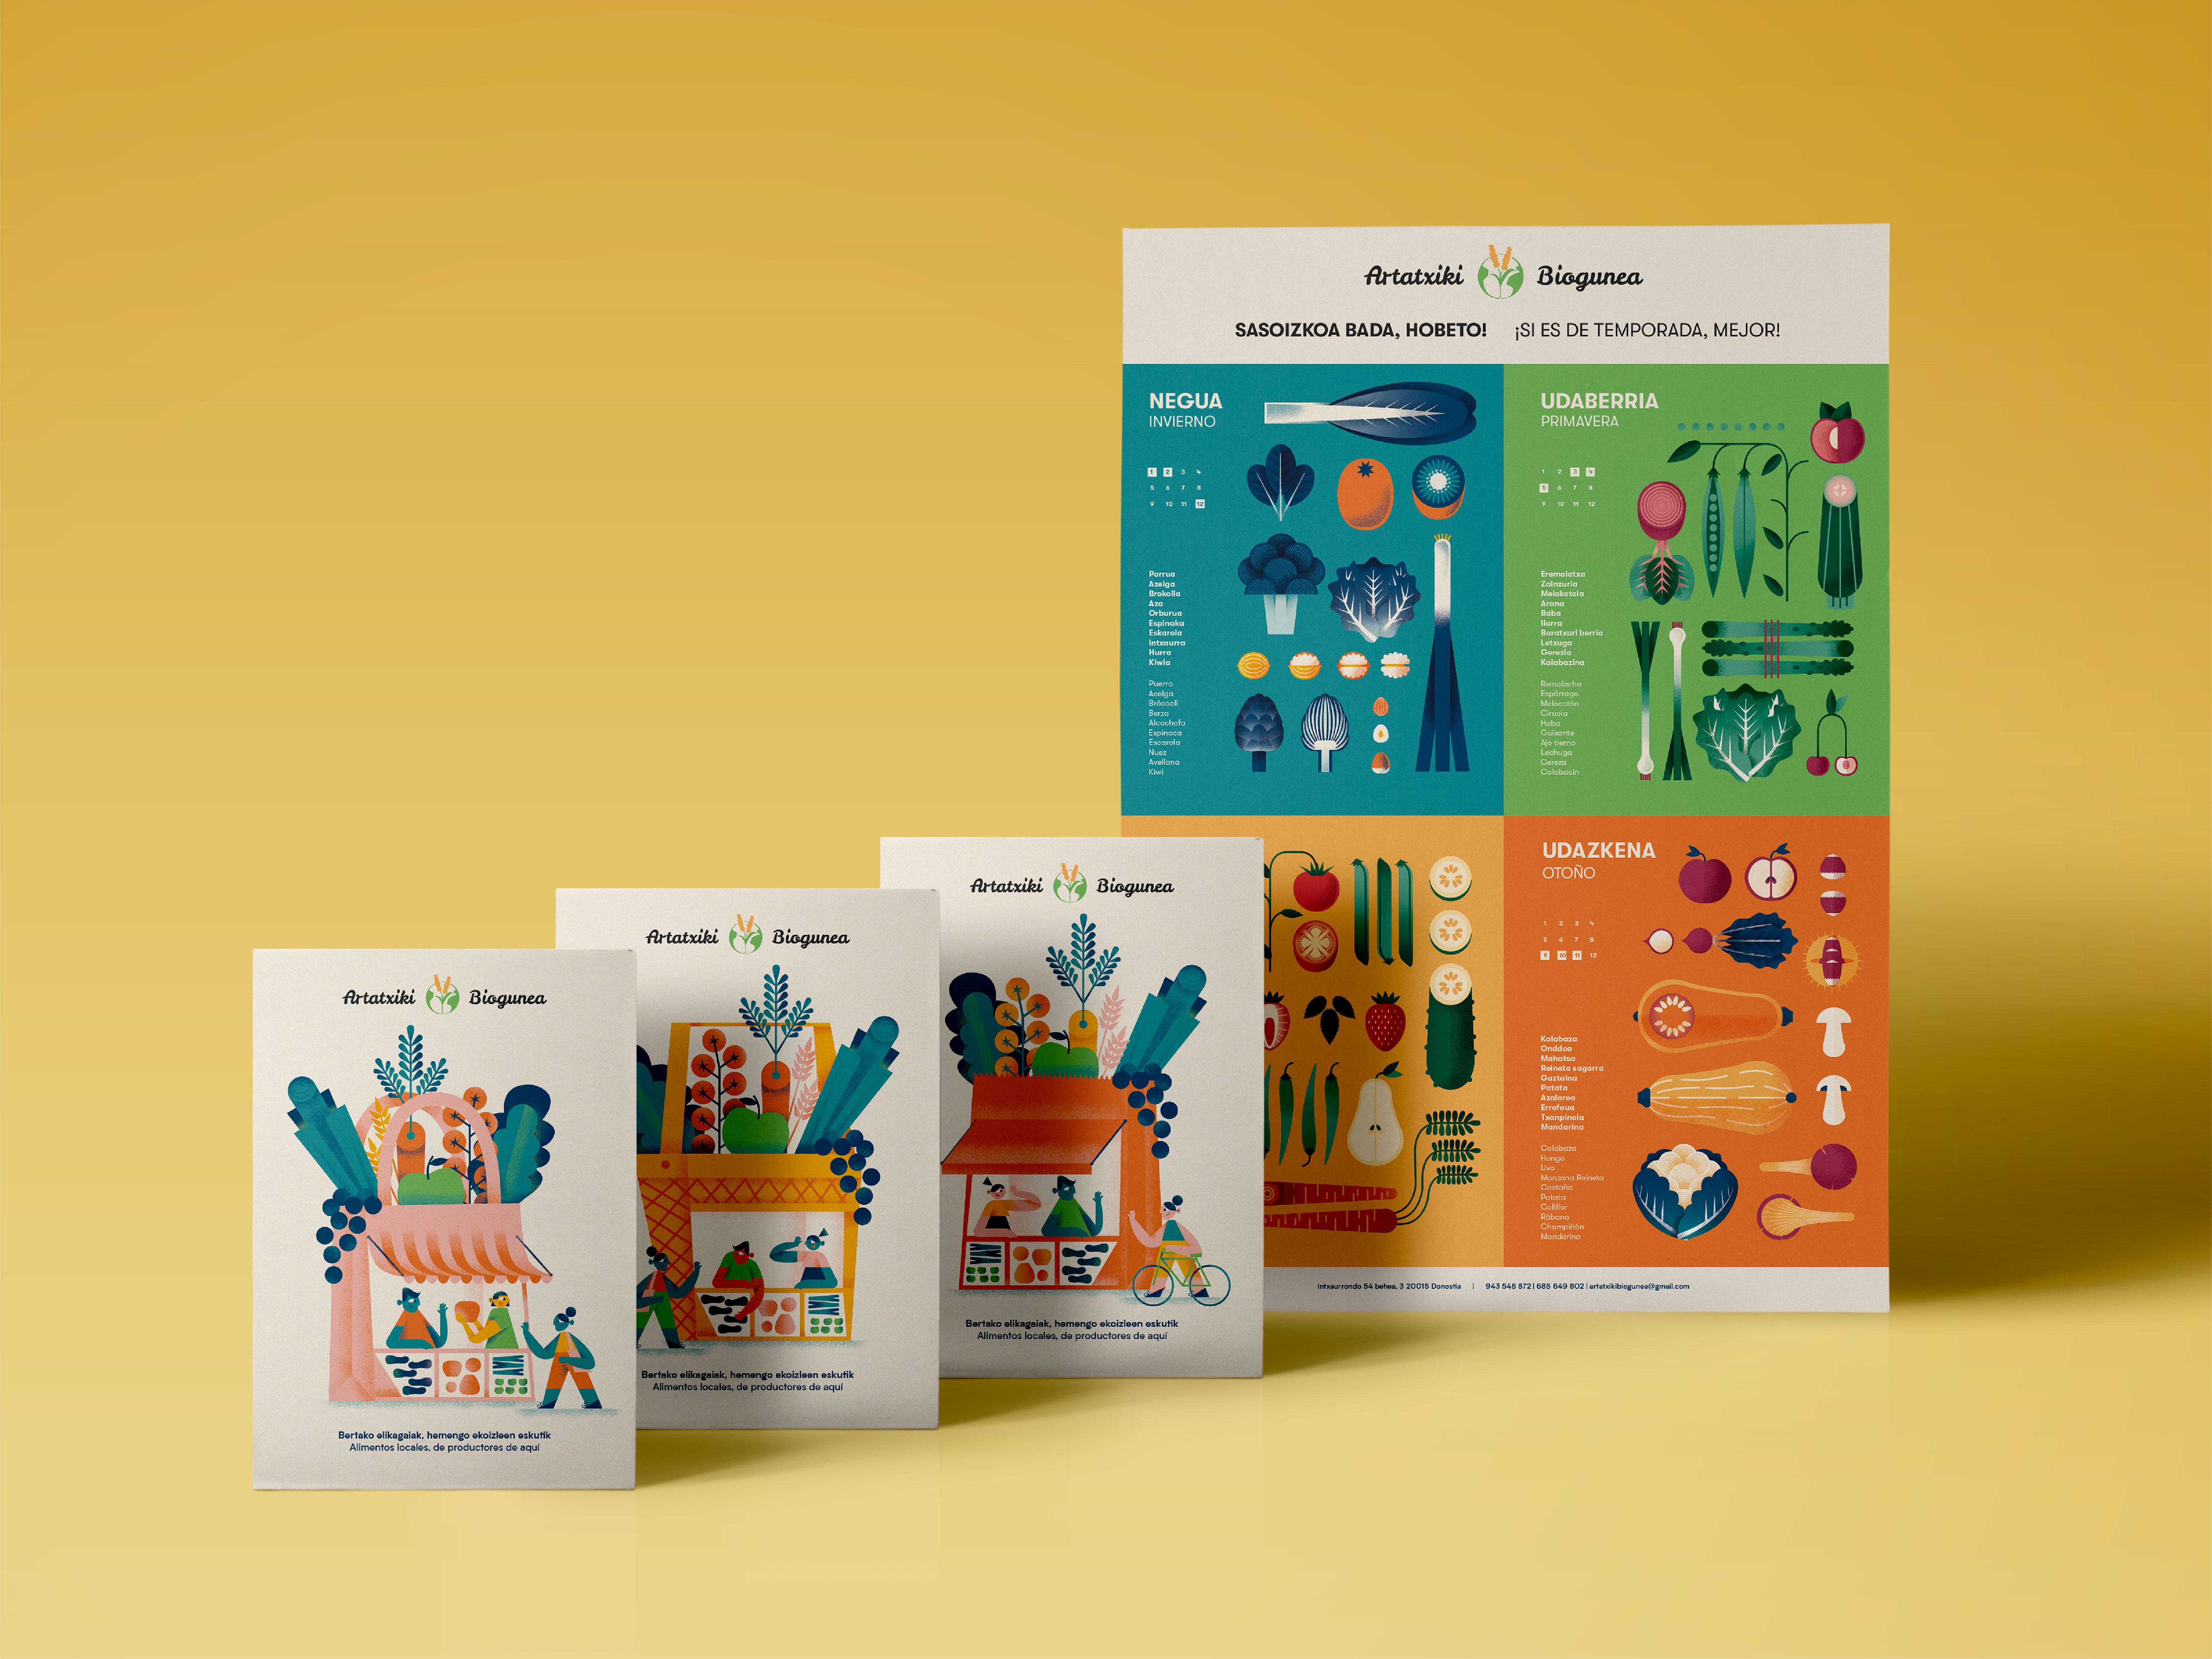 Mini-campaña para Artatxiki by Ane Arzelus - Creative Work